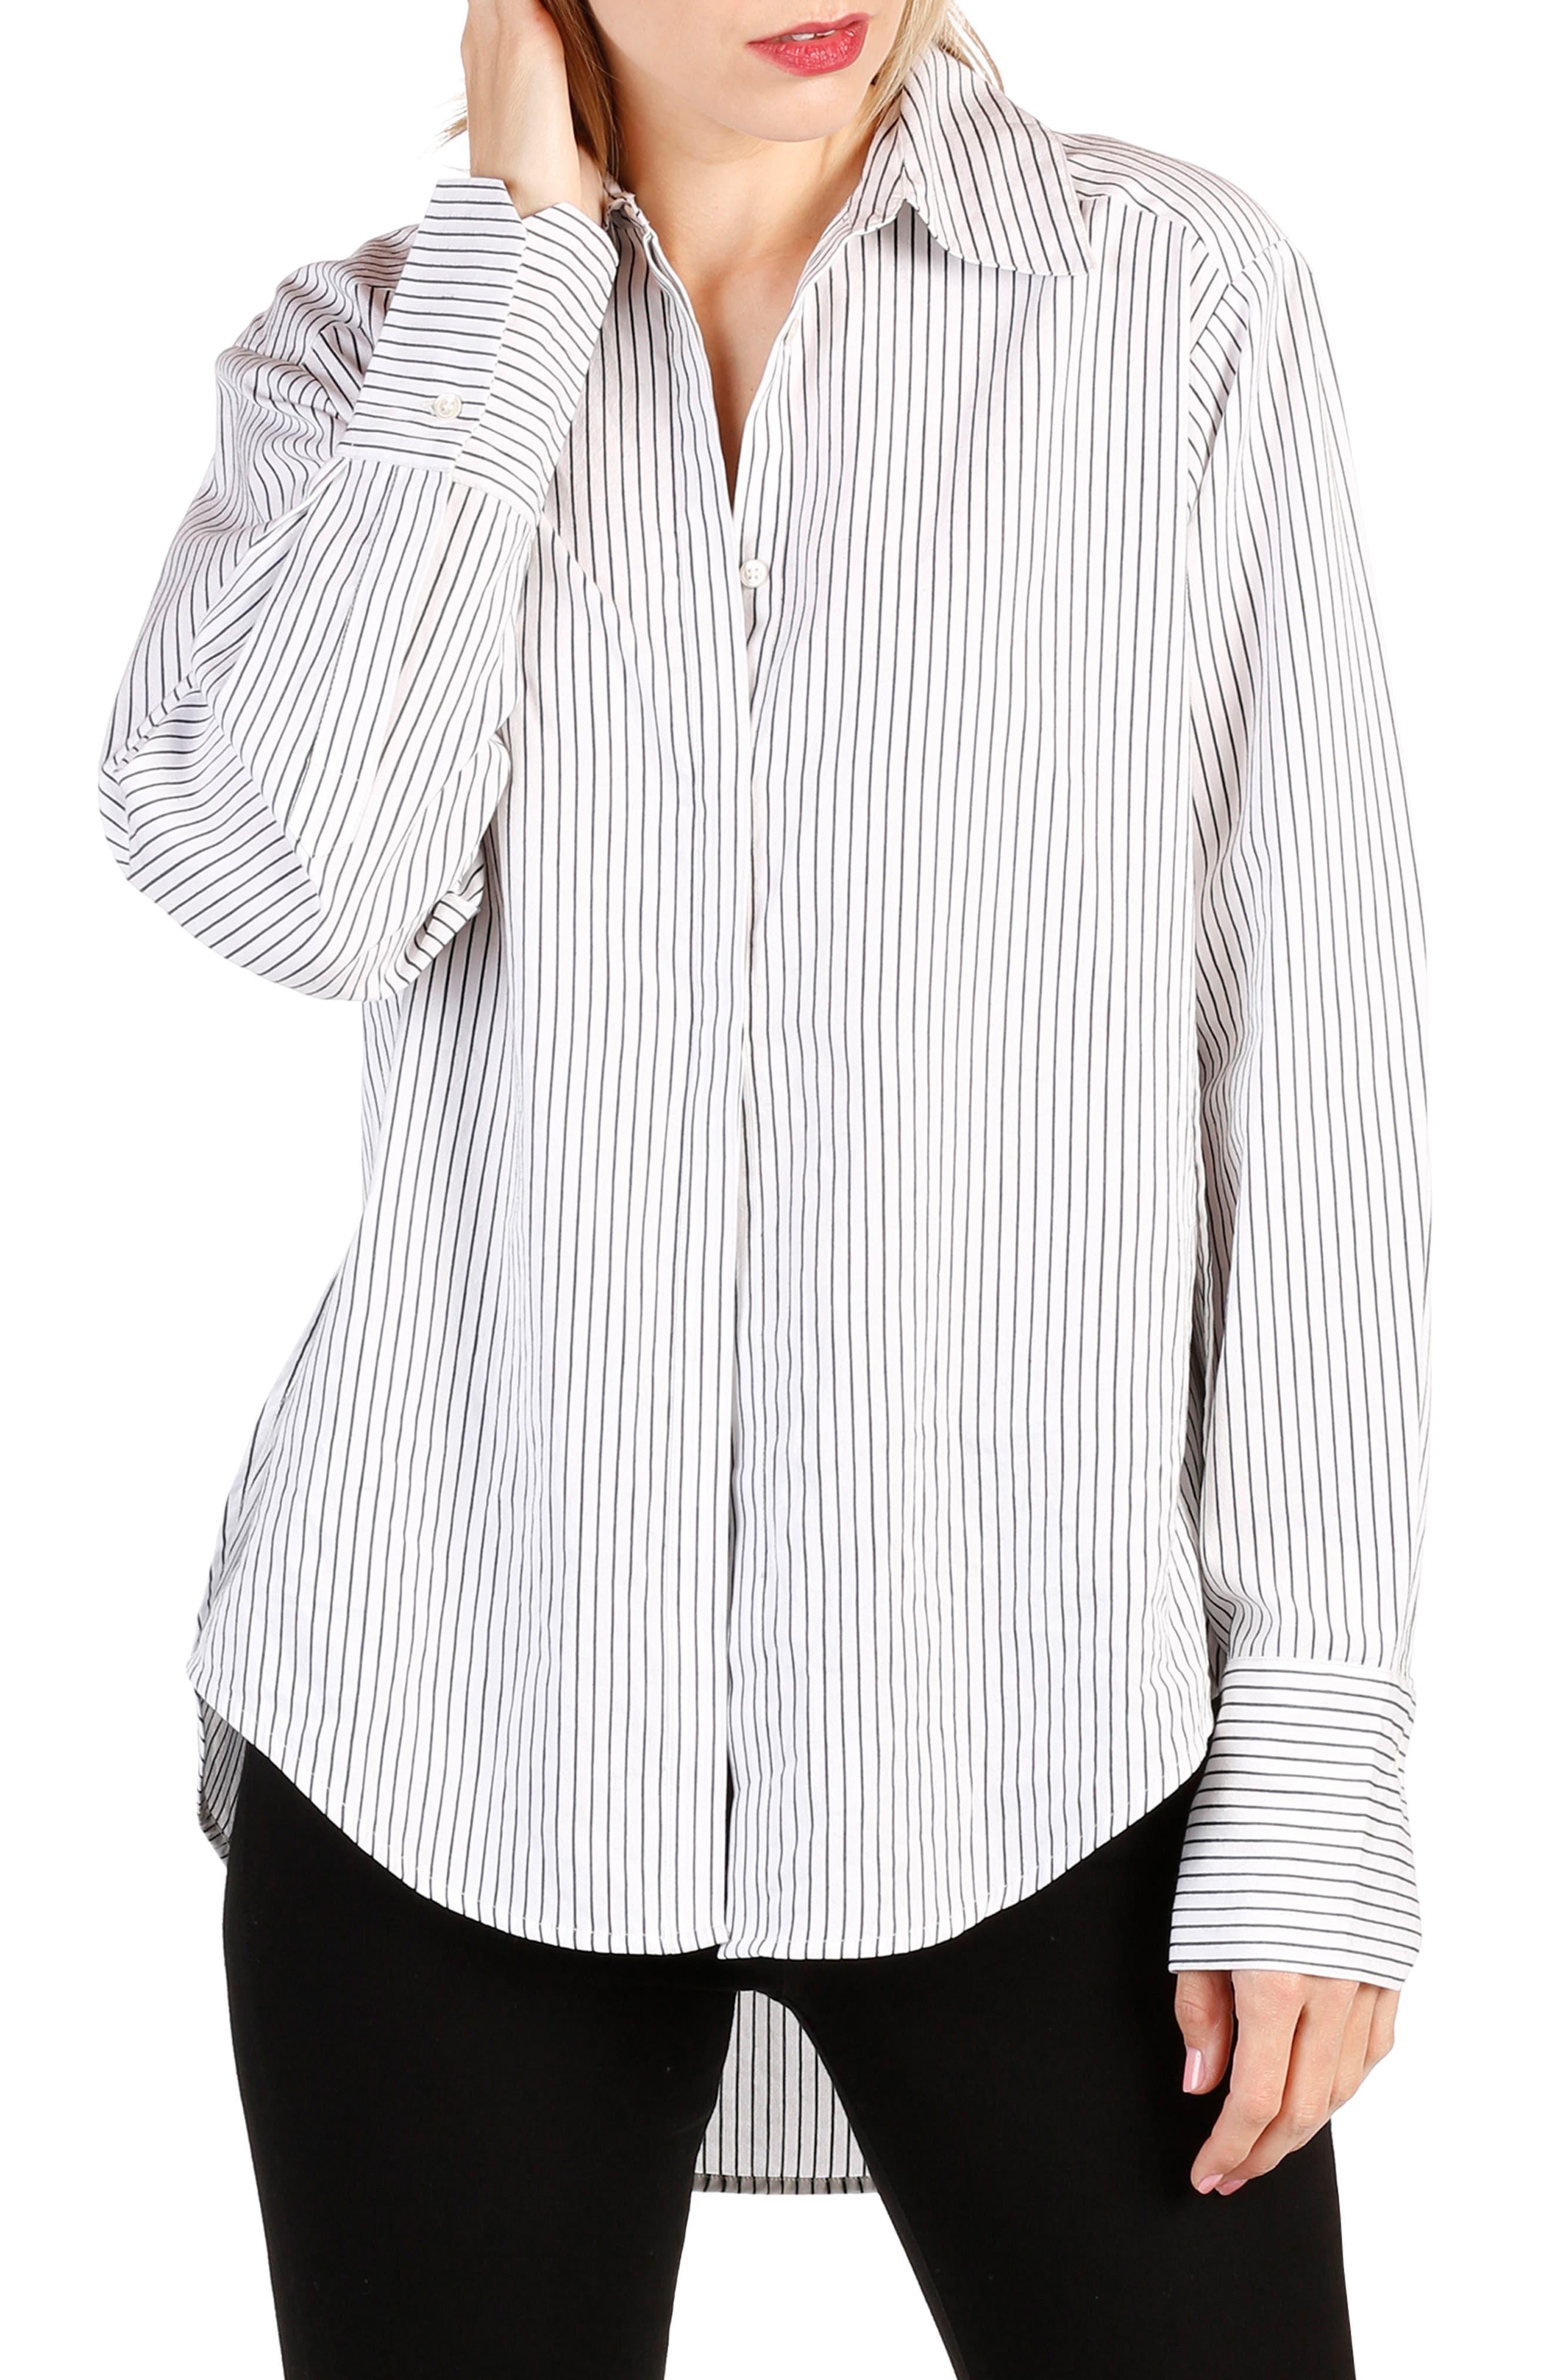 Clemence Stripe Shirt,                             Main thumbnail 1, color,                             006